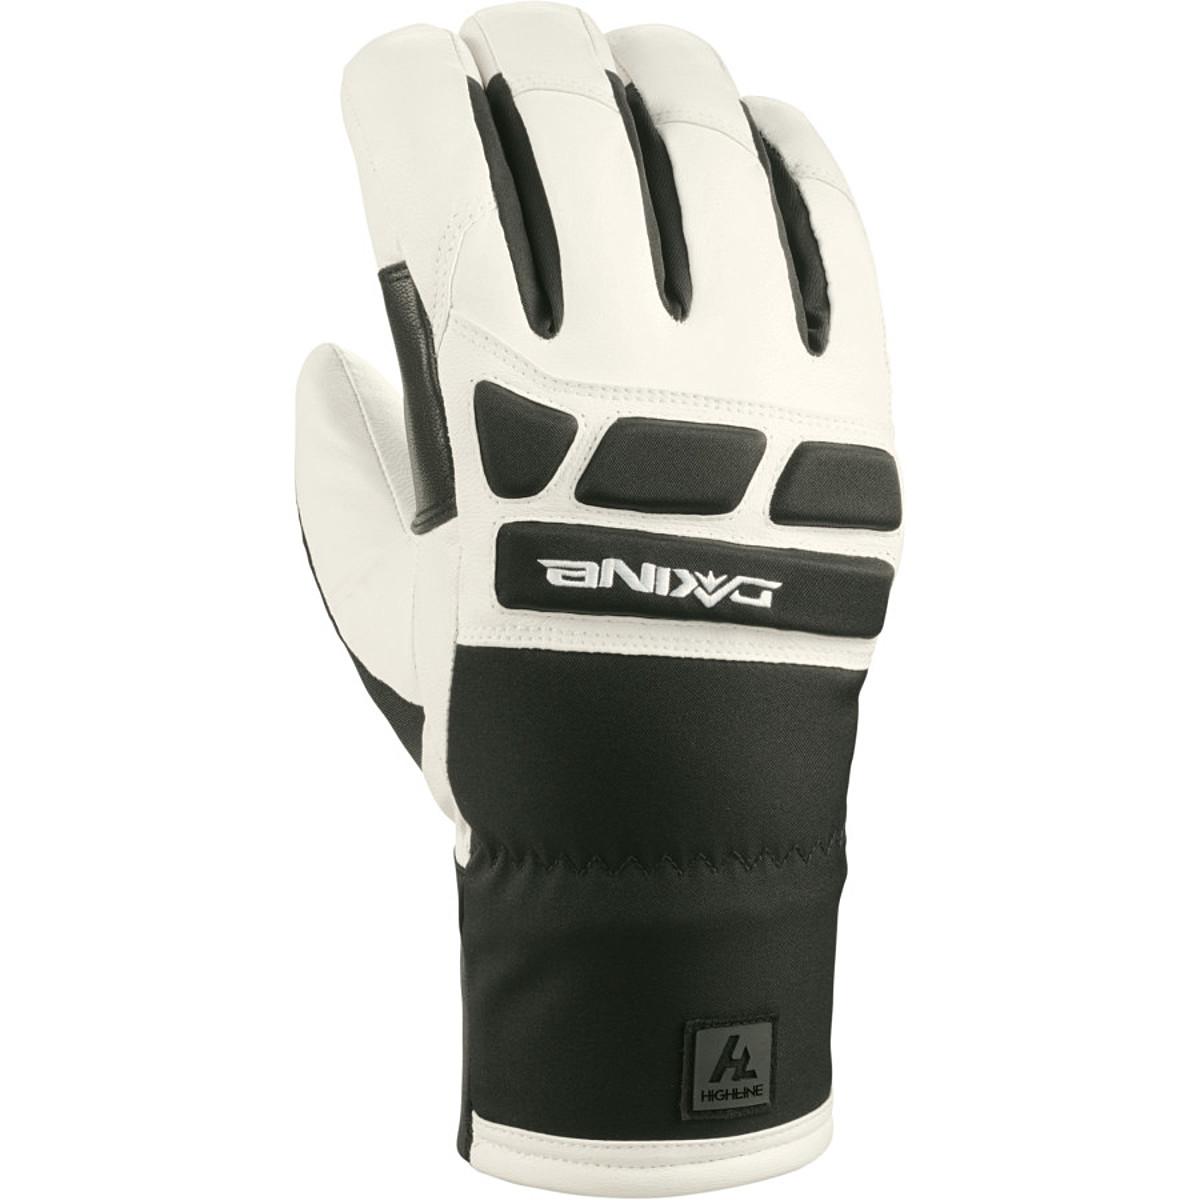 DaKine Wrangler Glove